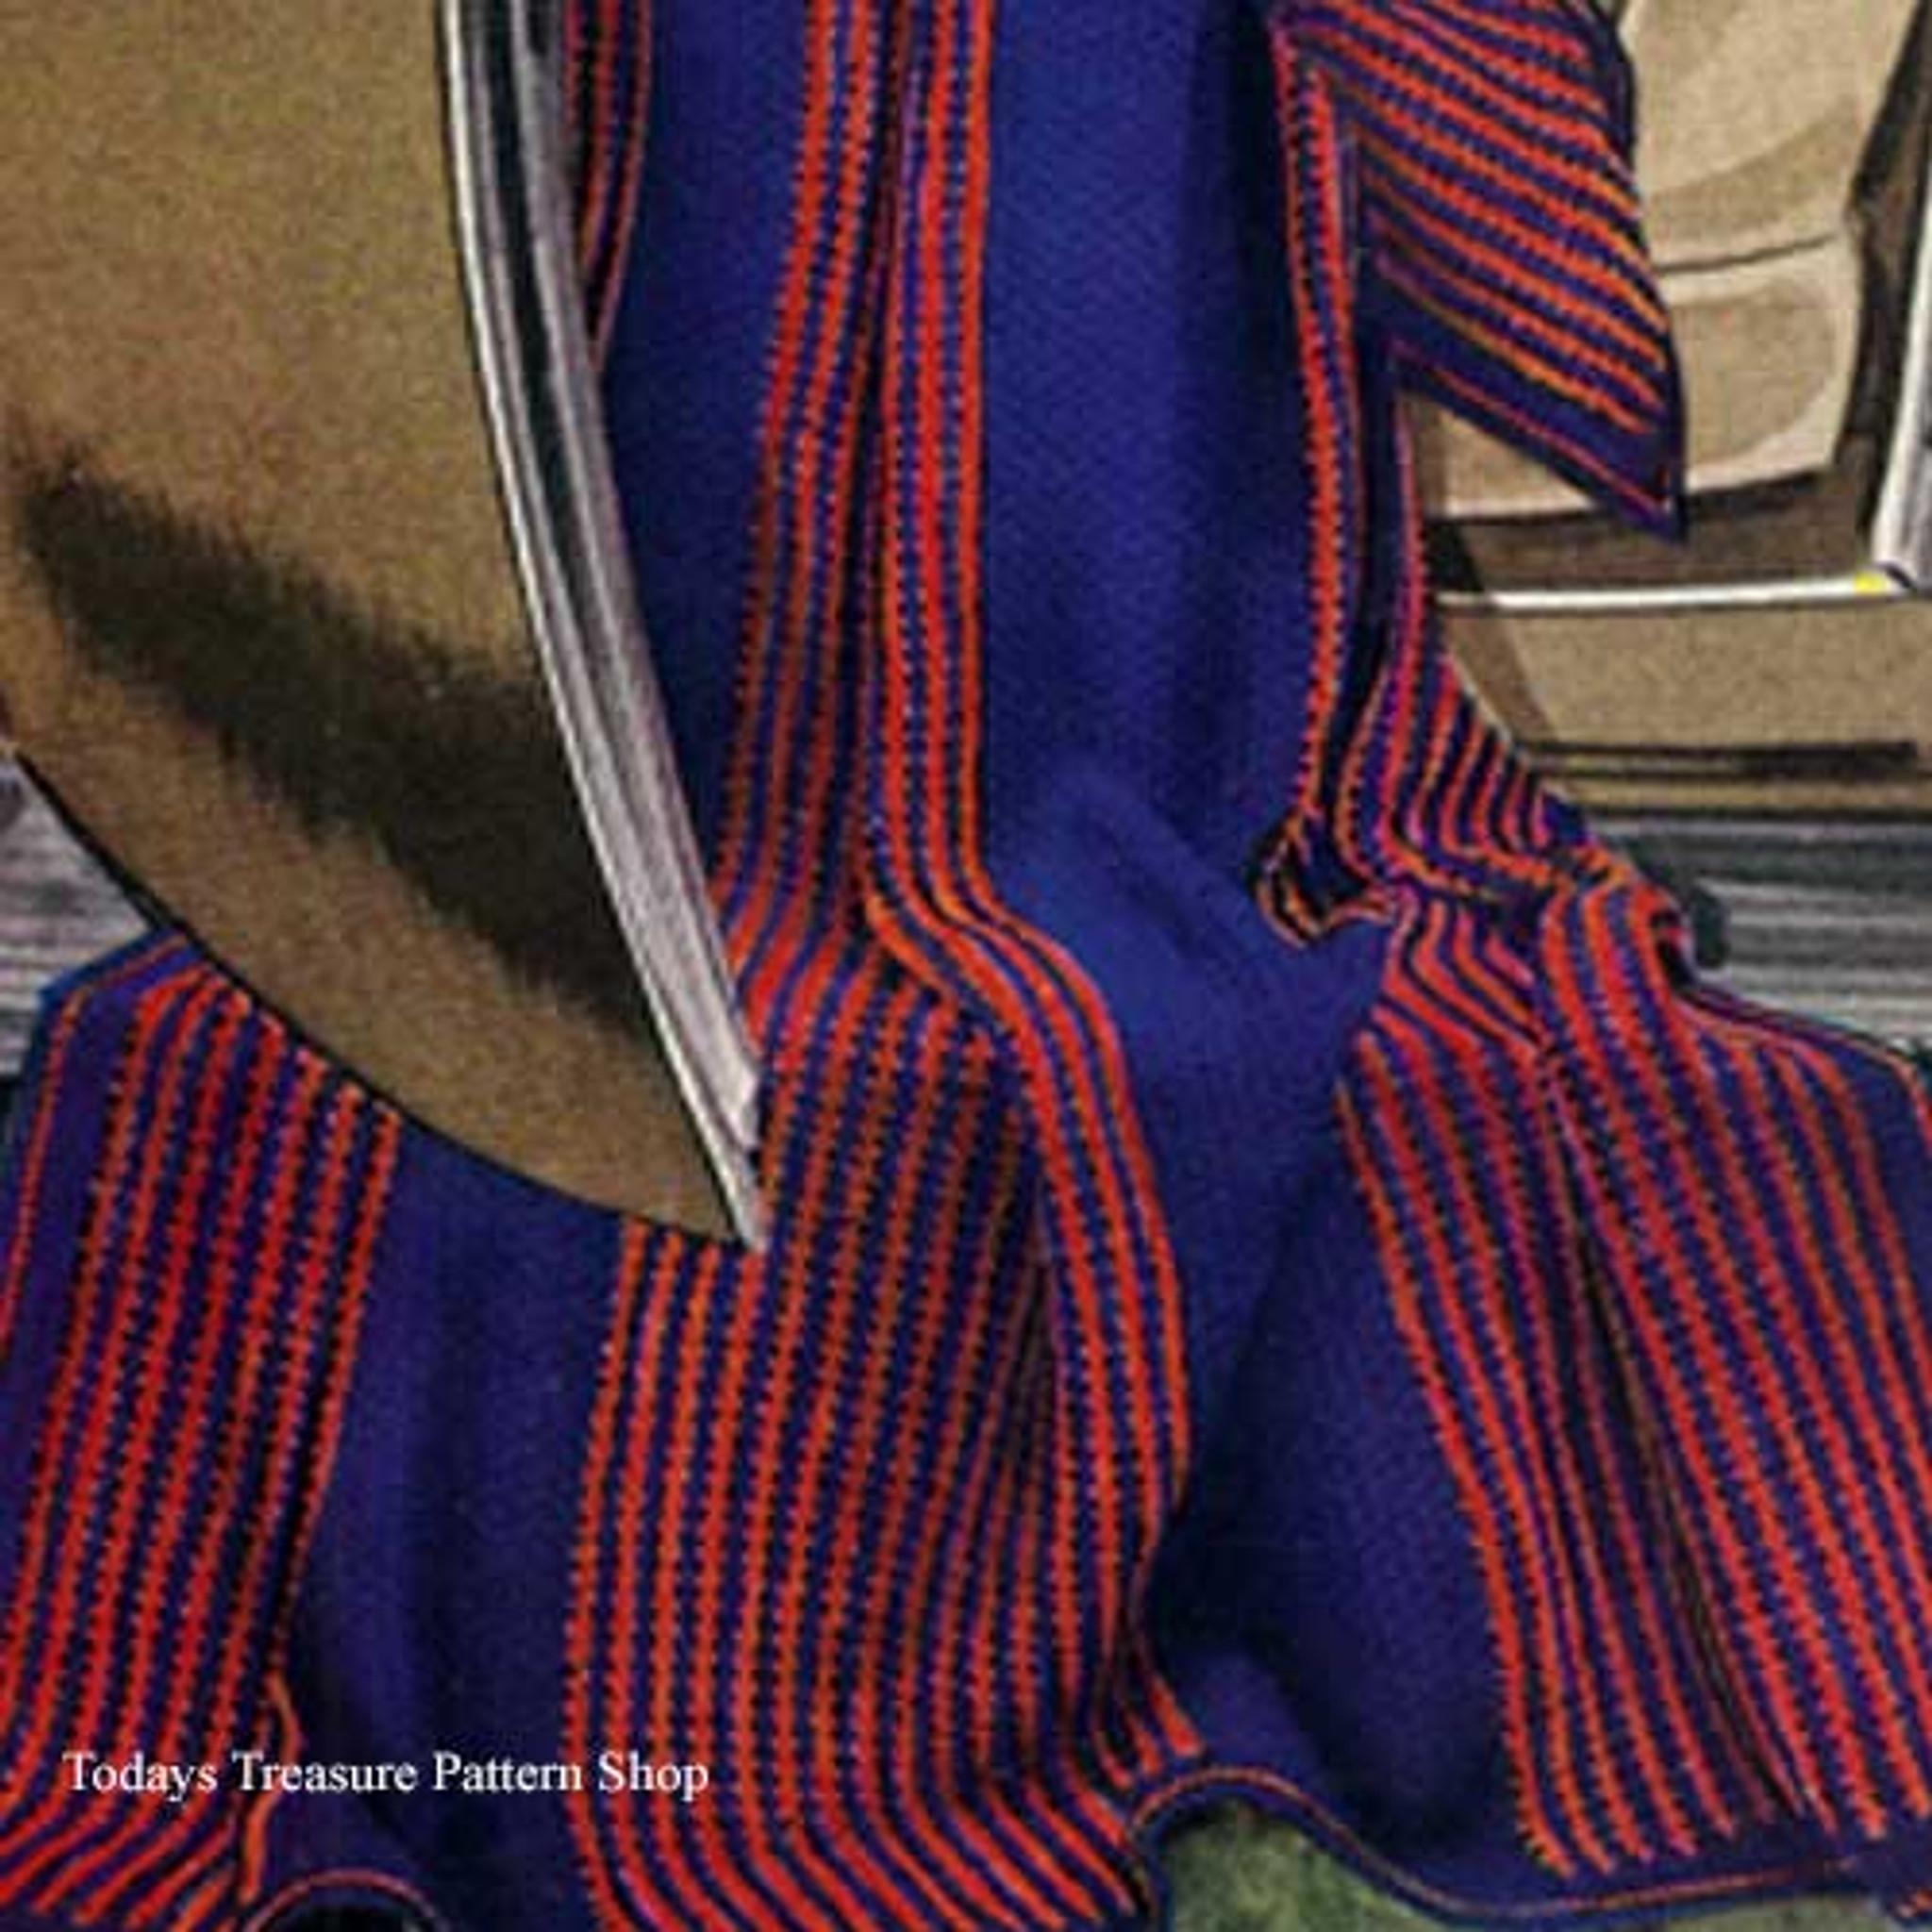 Striped Afghan Knitting Pattern : Knitted Regimental Striped Afghan Pattern